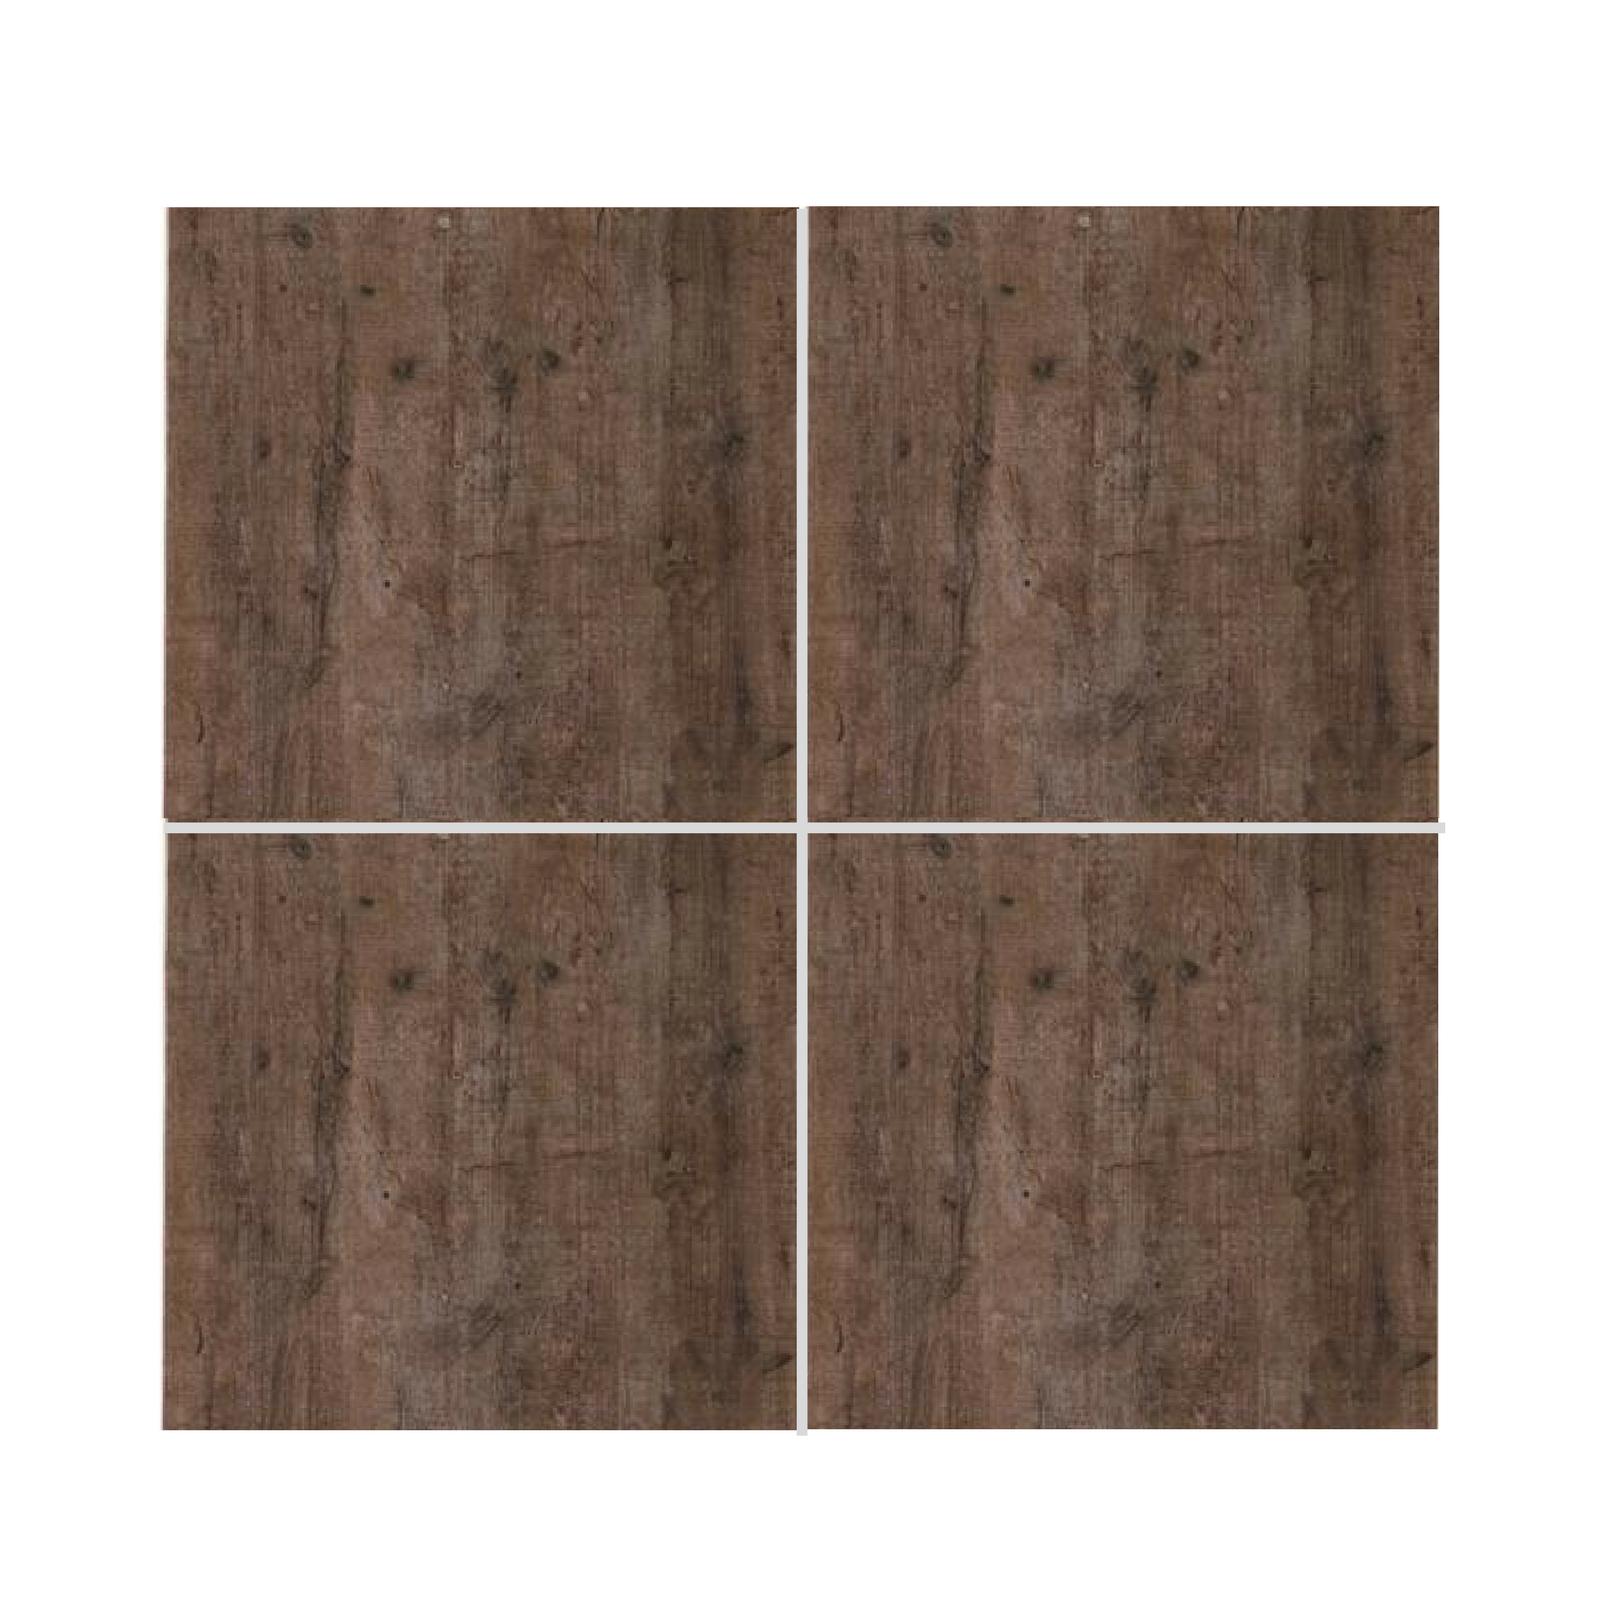 Beyond Tiles 2400 x 620mm x 10mm Rough Wood Fibo Waterproof Wall Panel